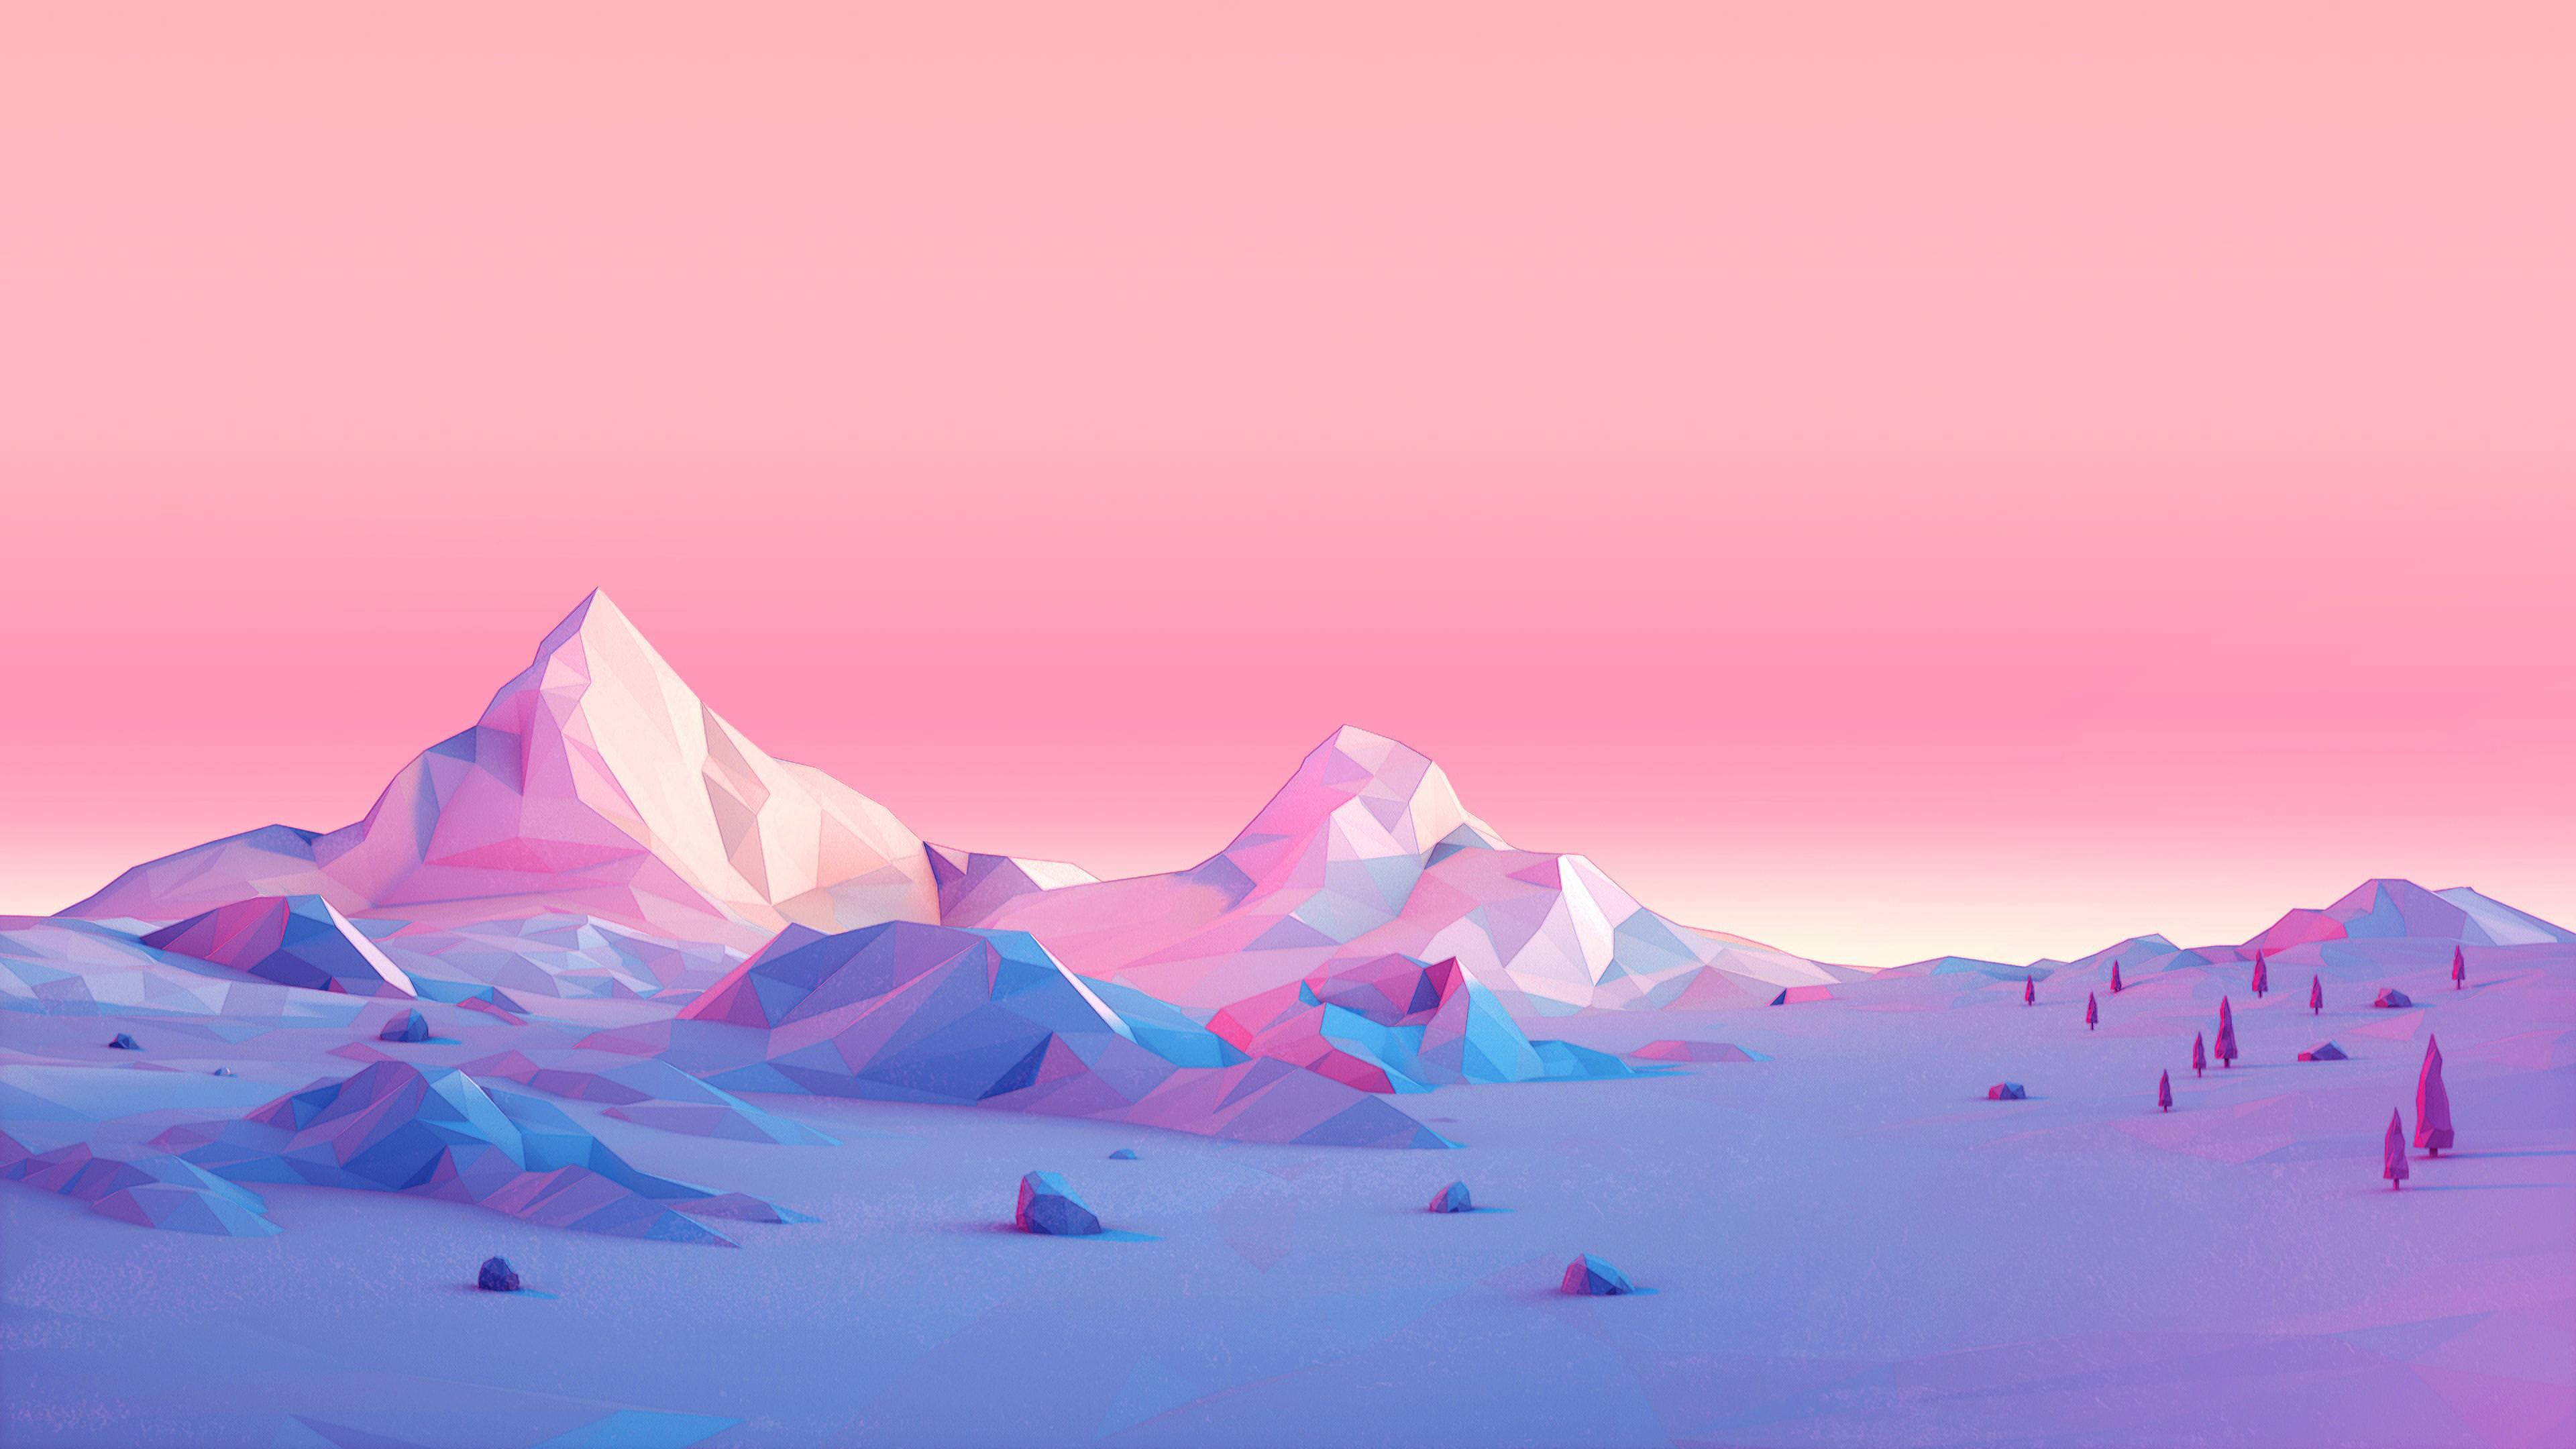 Minimalism Mountain Peak Full Hd Wallpaper: Polygon Mountains Minimalist, HD Artist, 4k Wallpapers